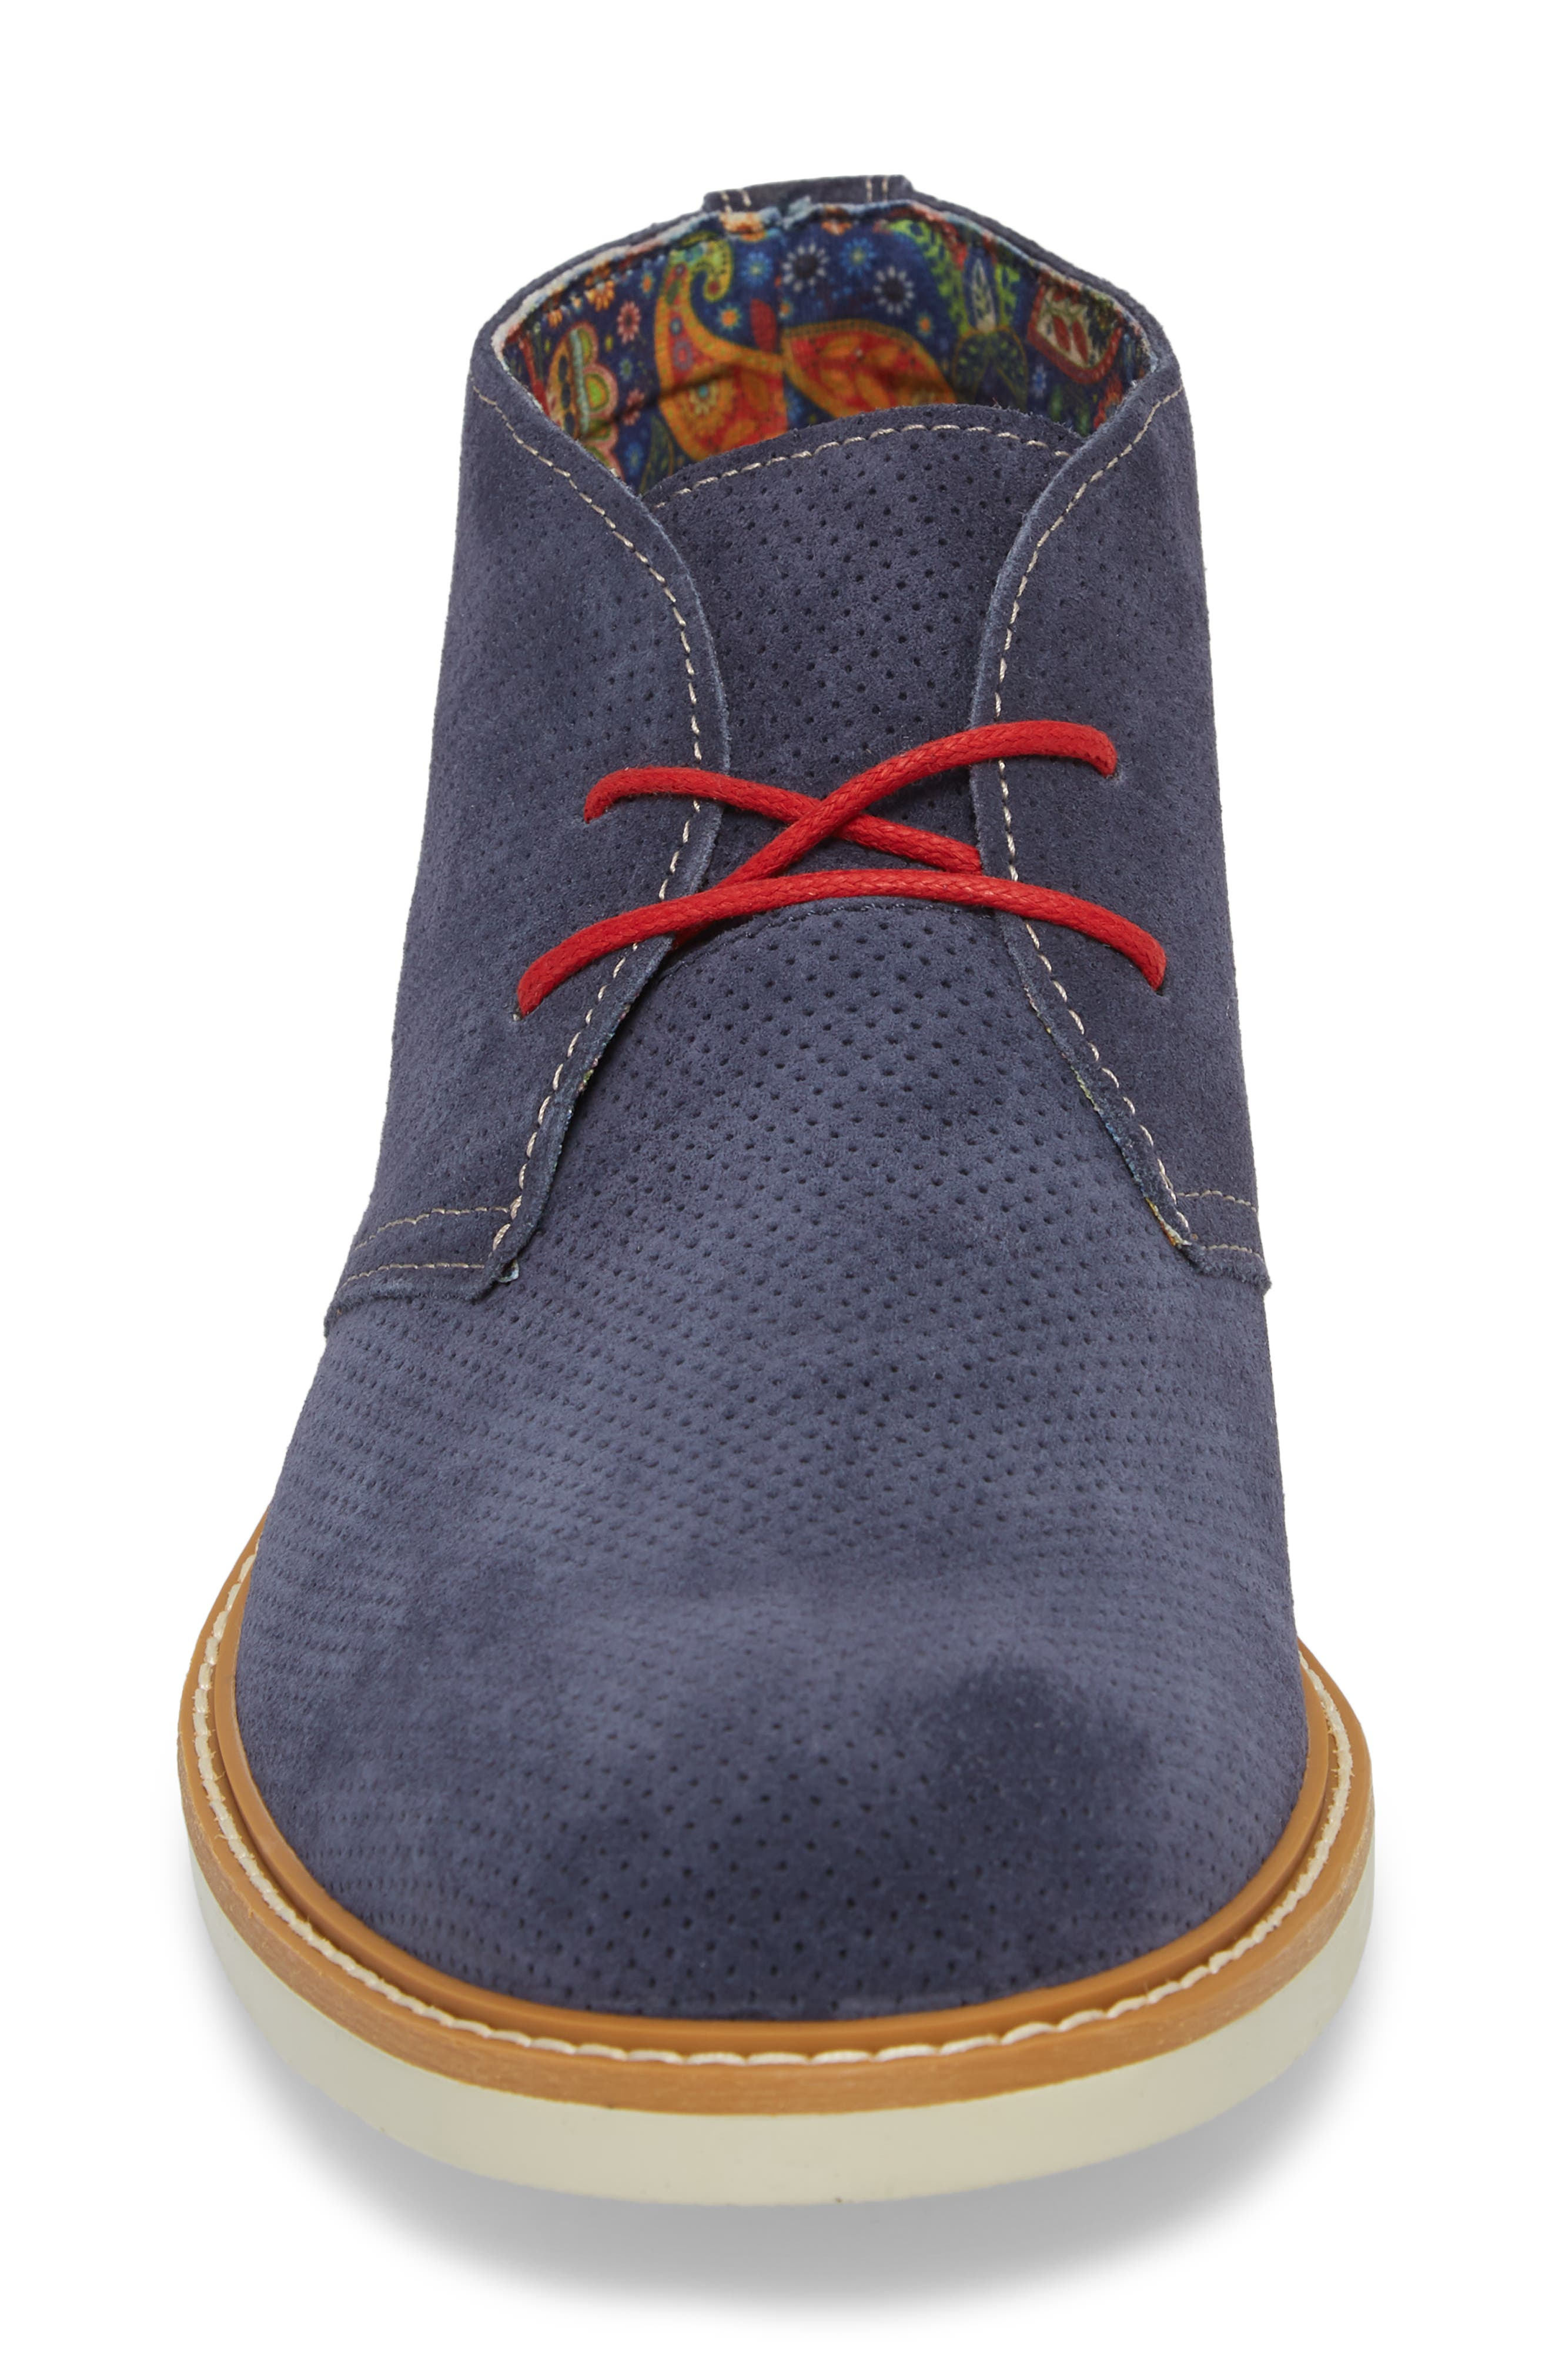 Bayside Perforated Chukka Boot,                             Alternate thumbnail 8, color,